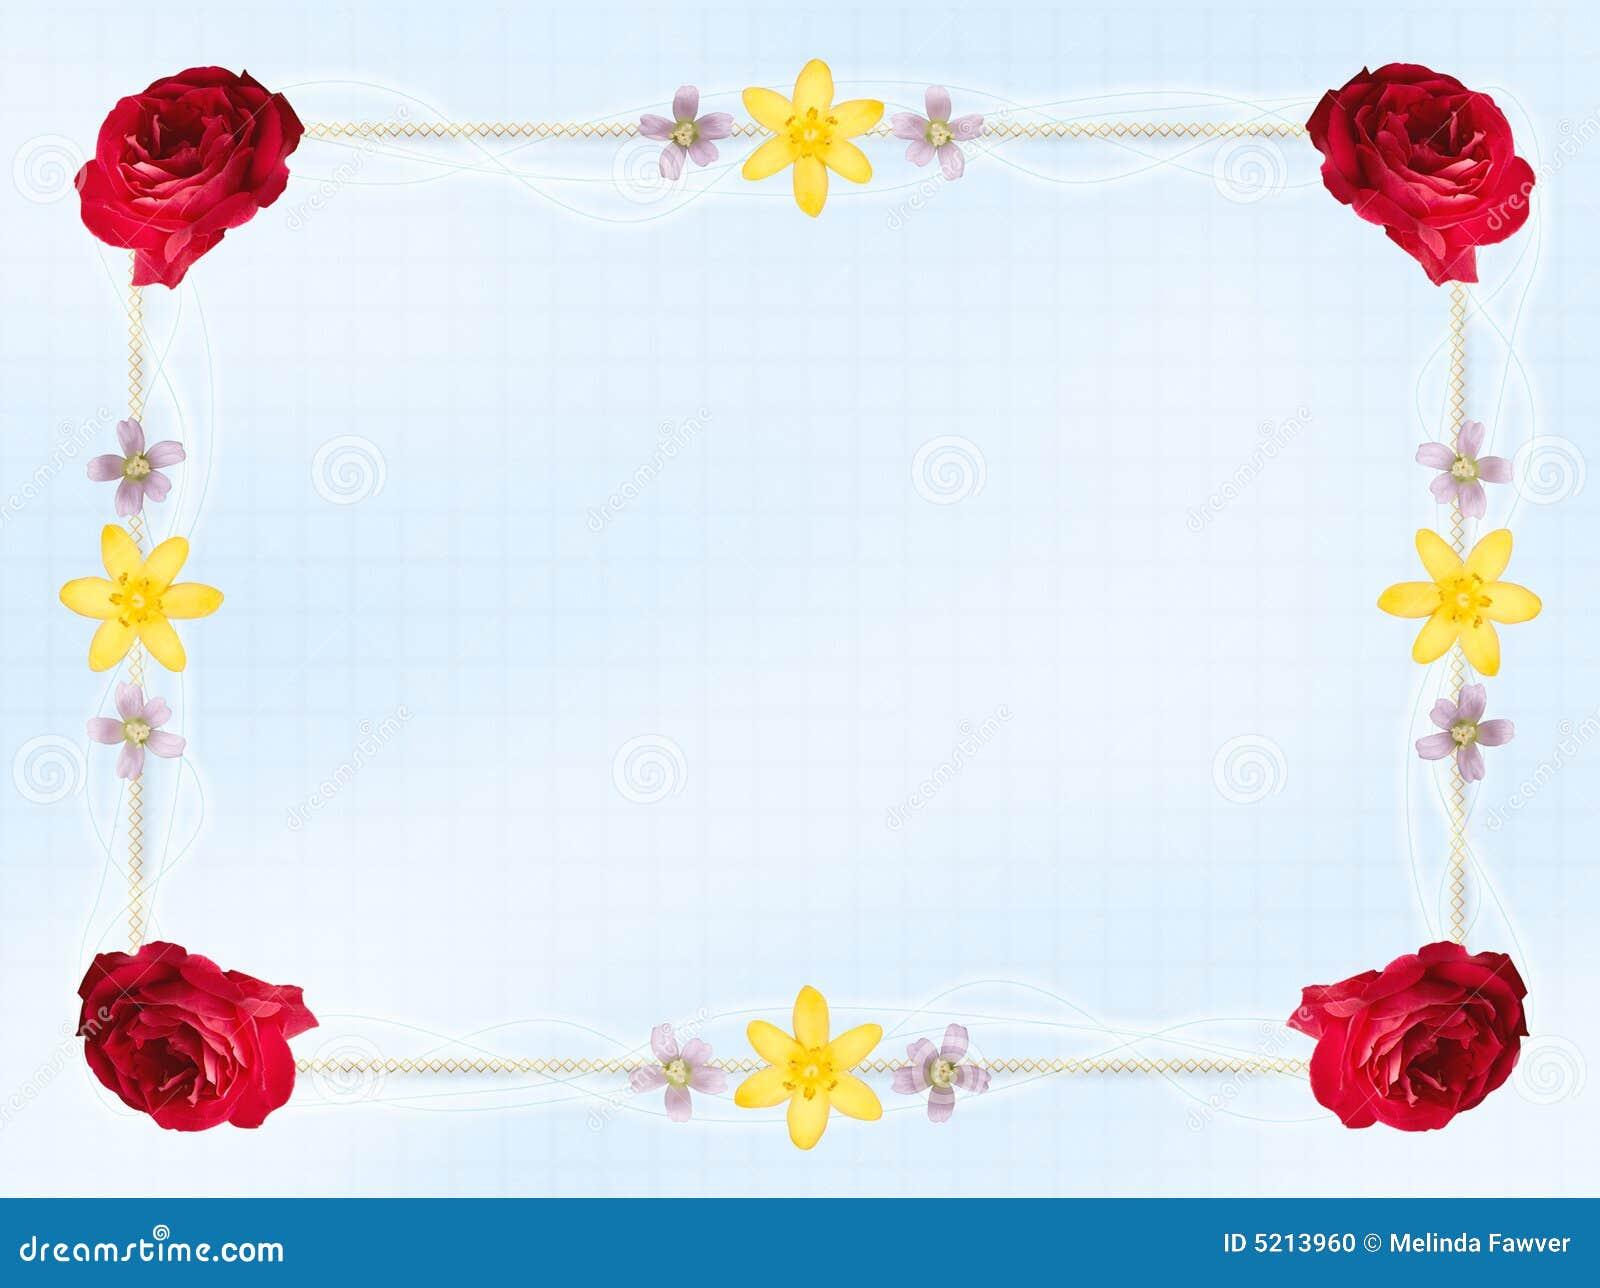 flower card border stock photo